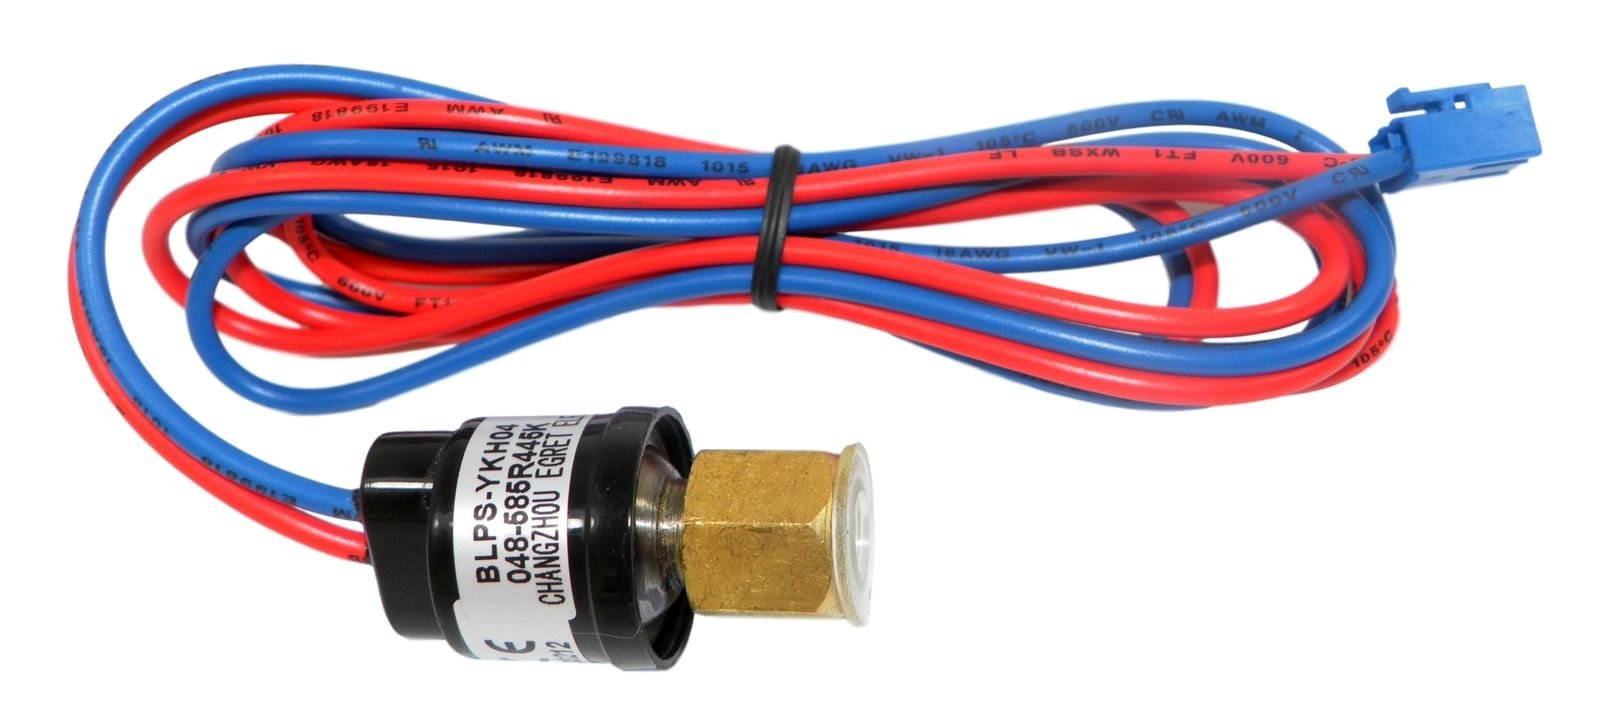 Changzhou BLPS-YKH04 HVAC Pressure Switch 048-585R445K, E0283700 by Changzhou